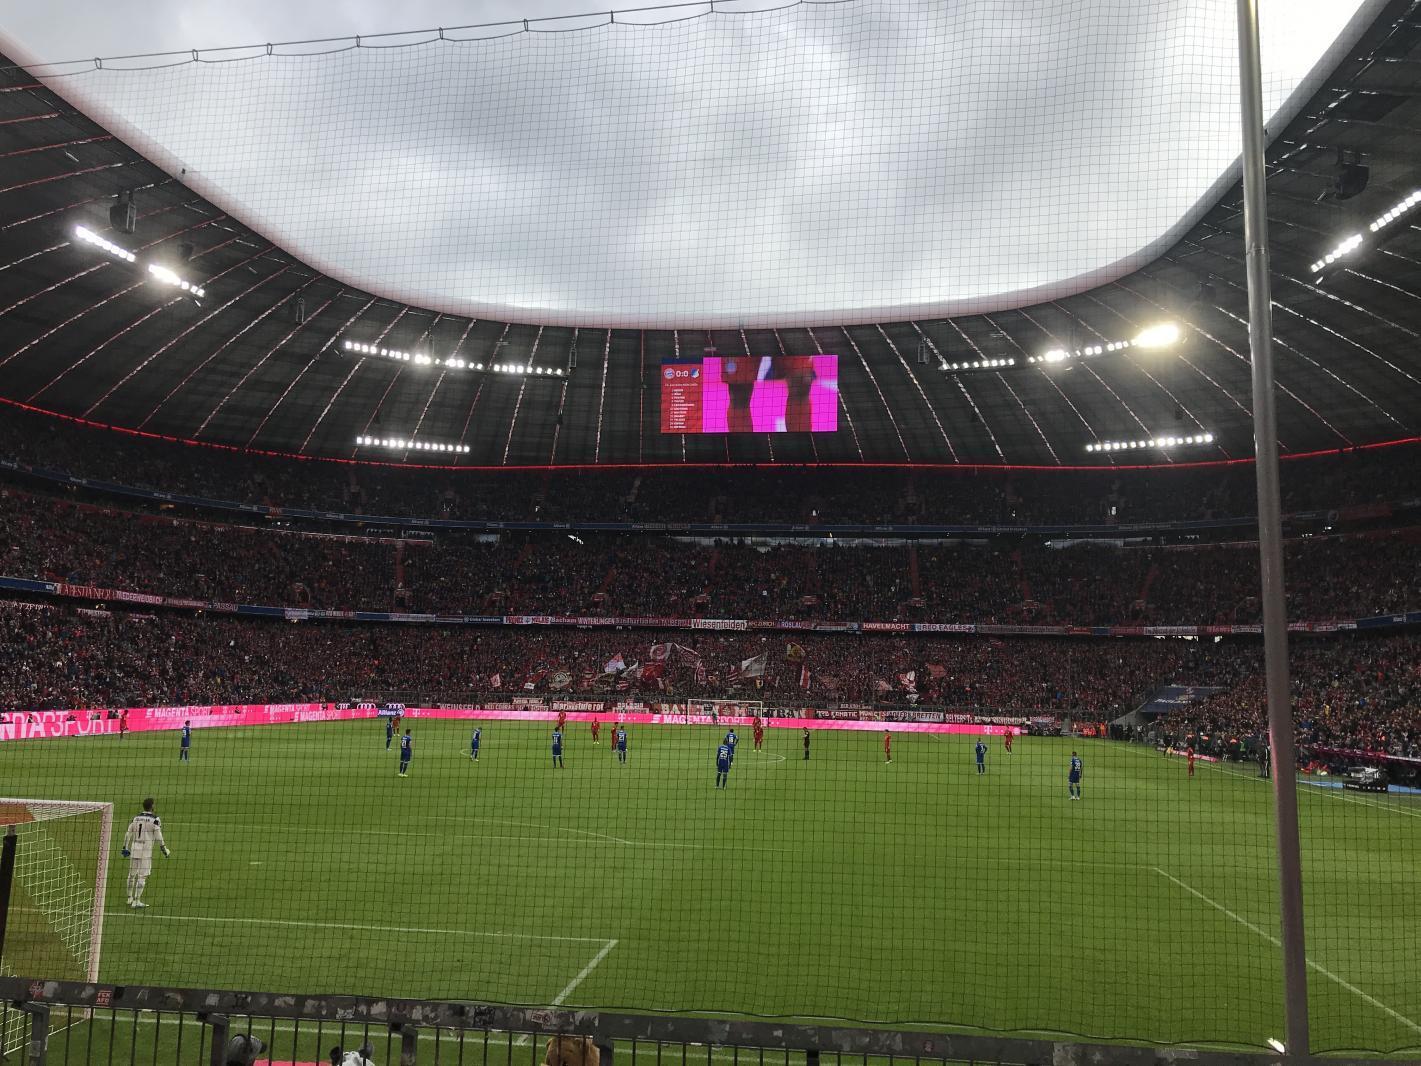 FC Bayern München – Turn- und Sportgemeinschaft Hoffenheim 1899 e. V am 05.10.2019